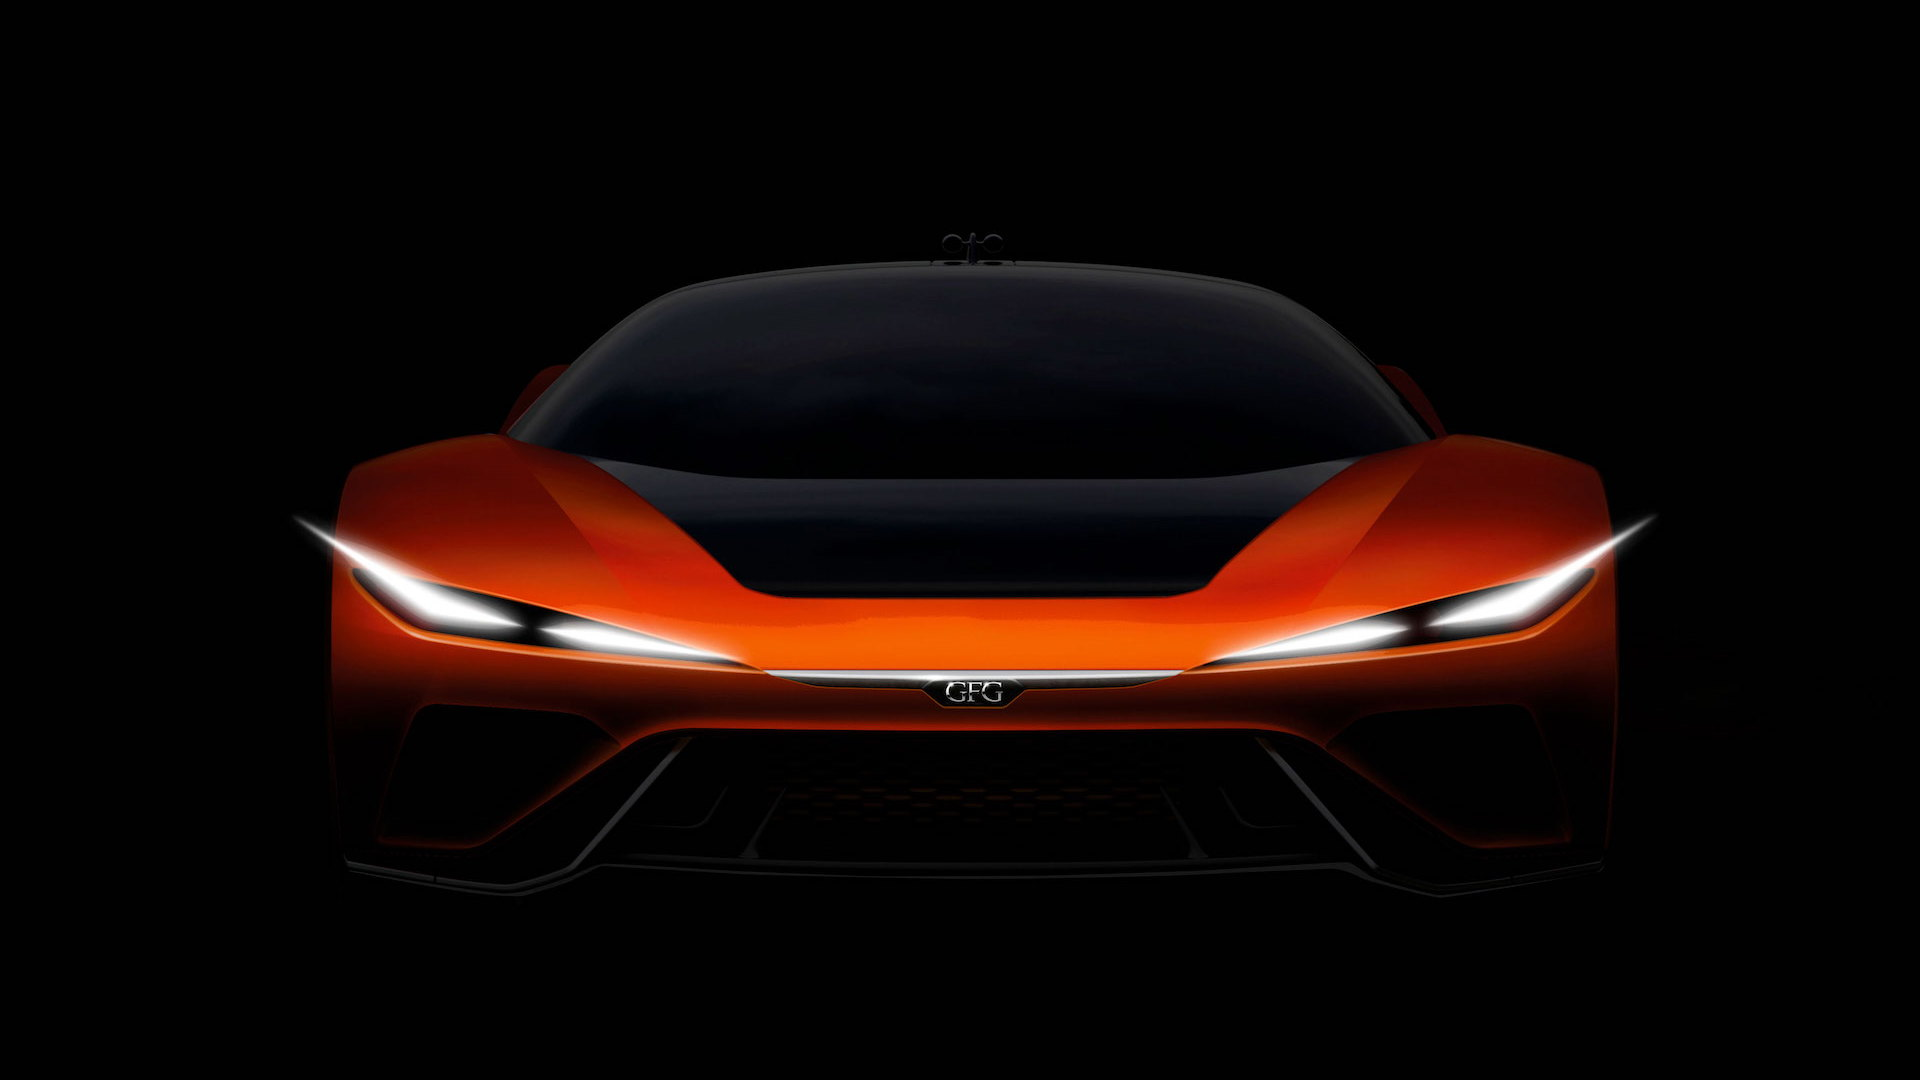 GFG Style Kangaroo electric hyper SUV concept teaser